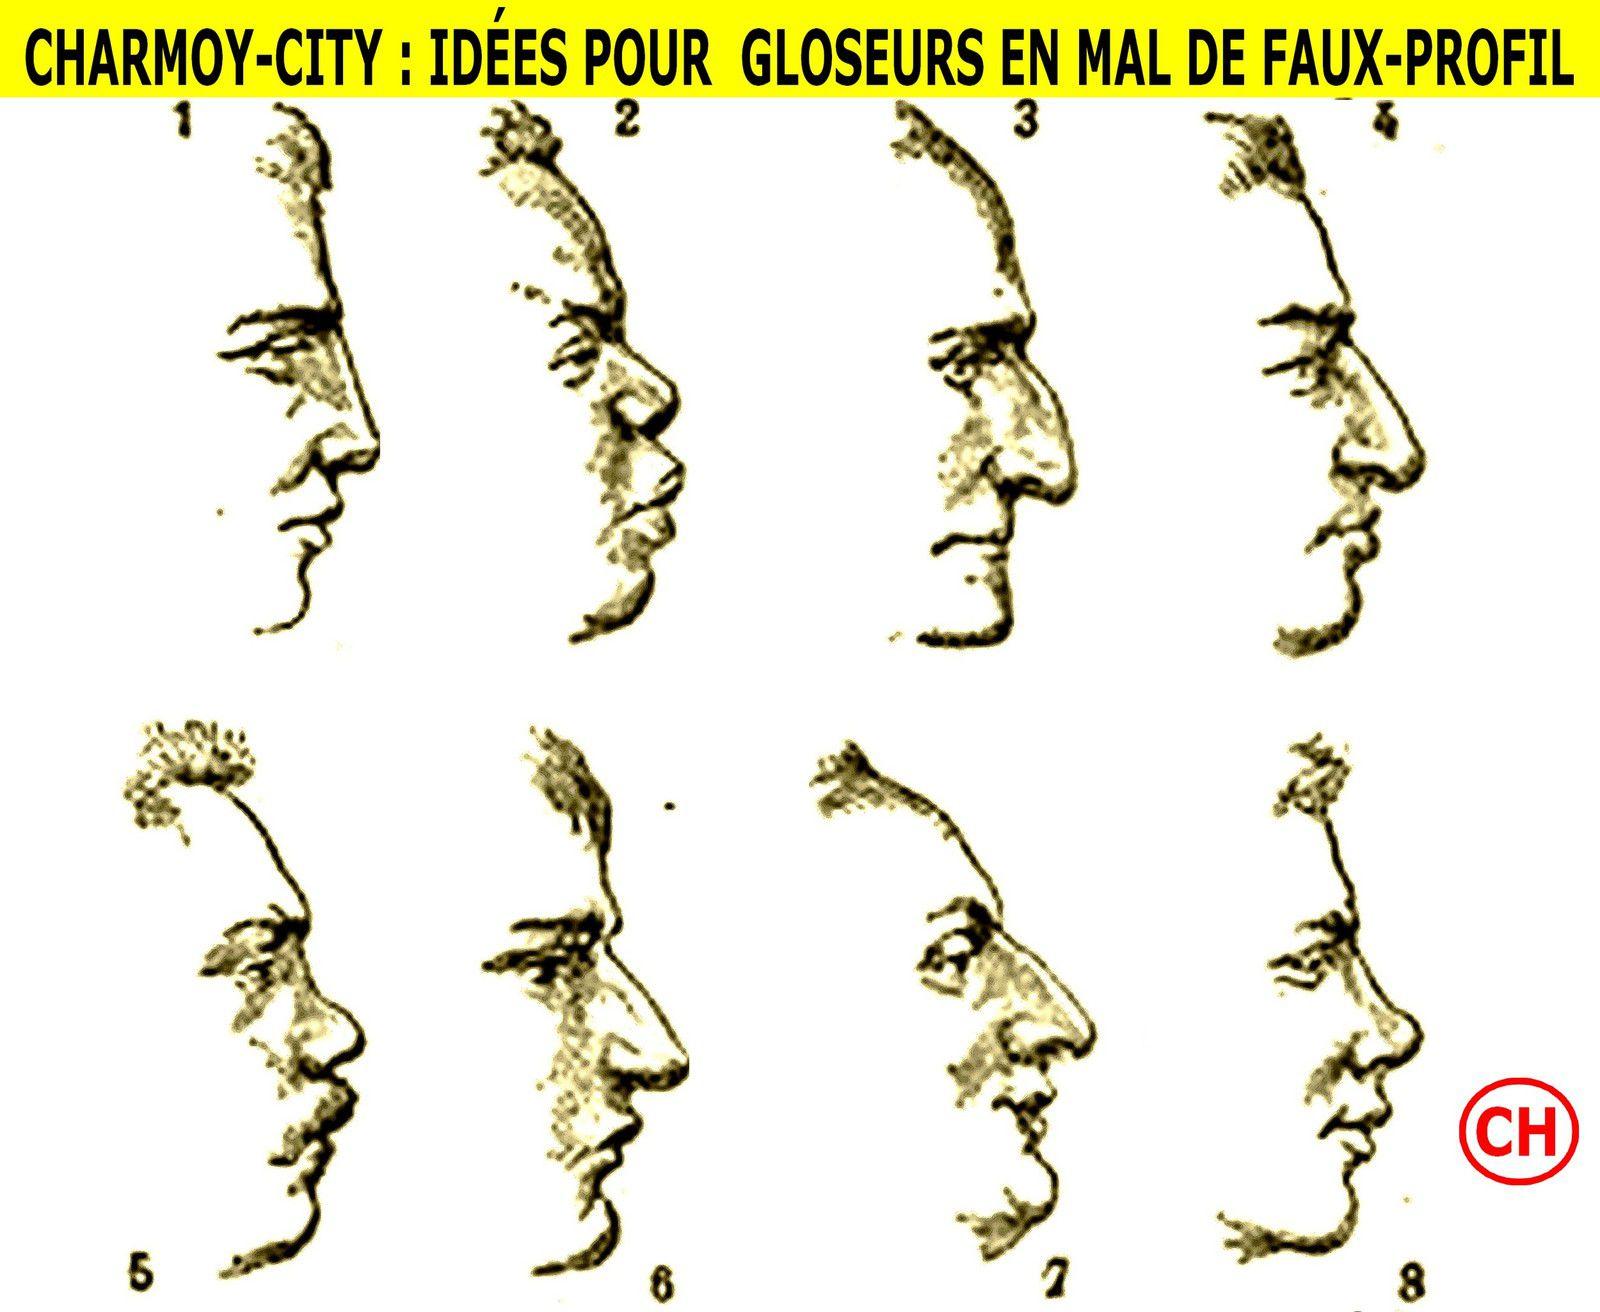 Charmoy-City, idées pour gloseurs en mal de faux-profil.jpg